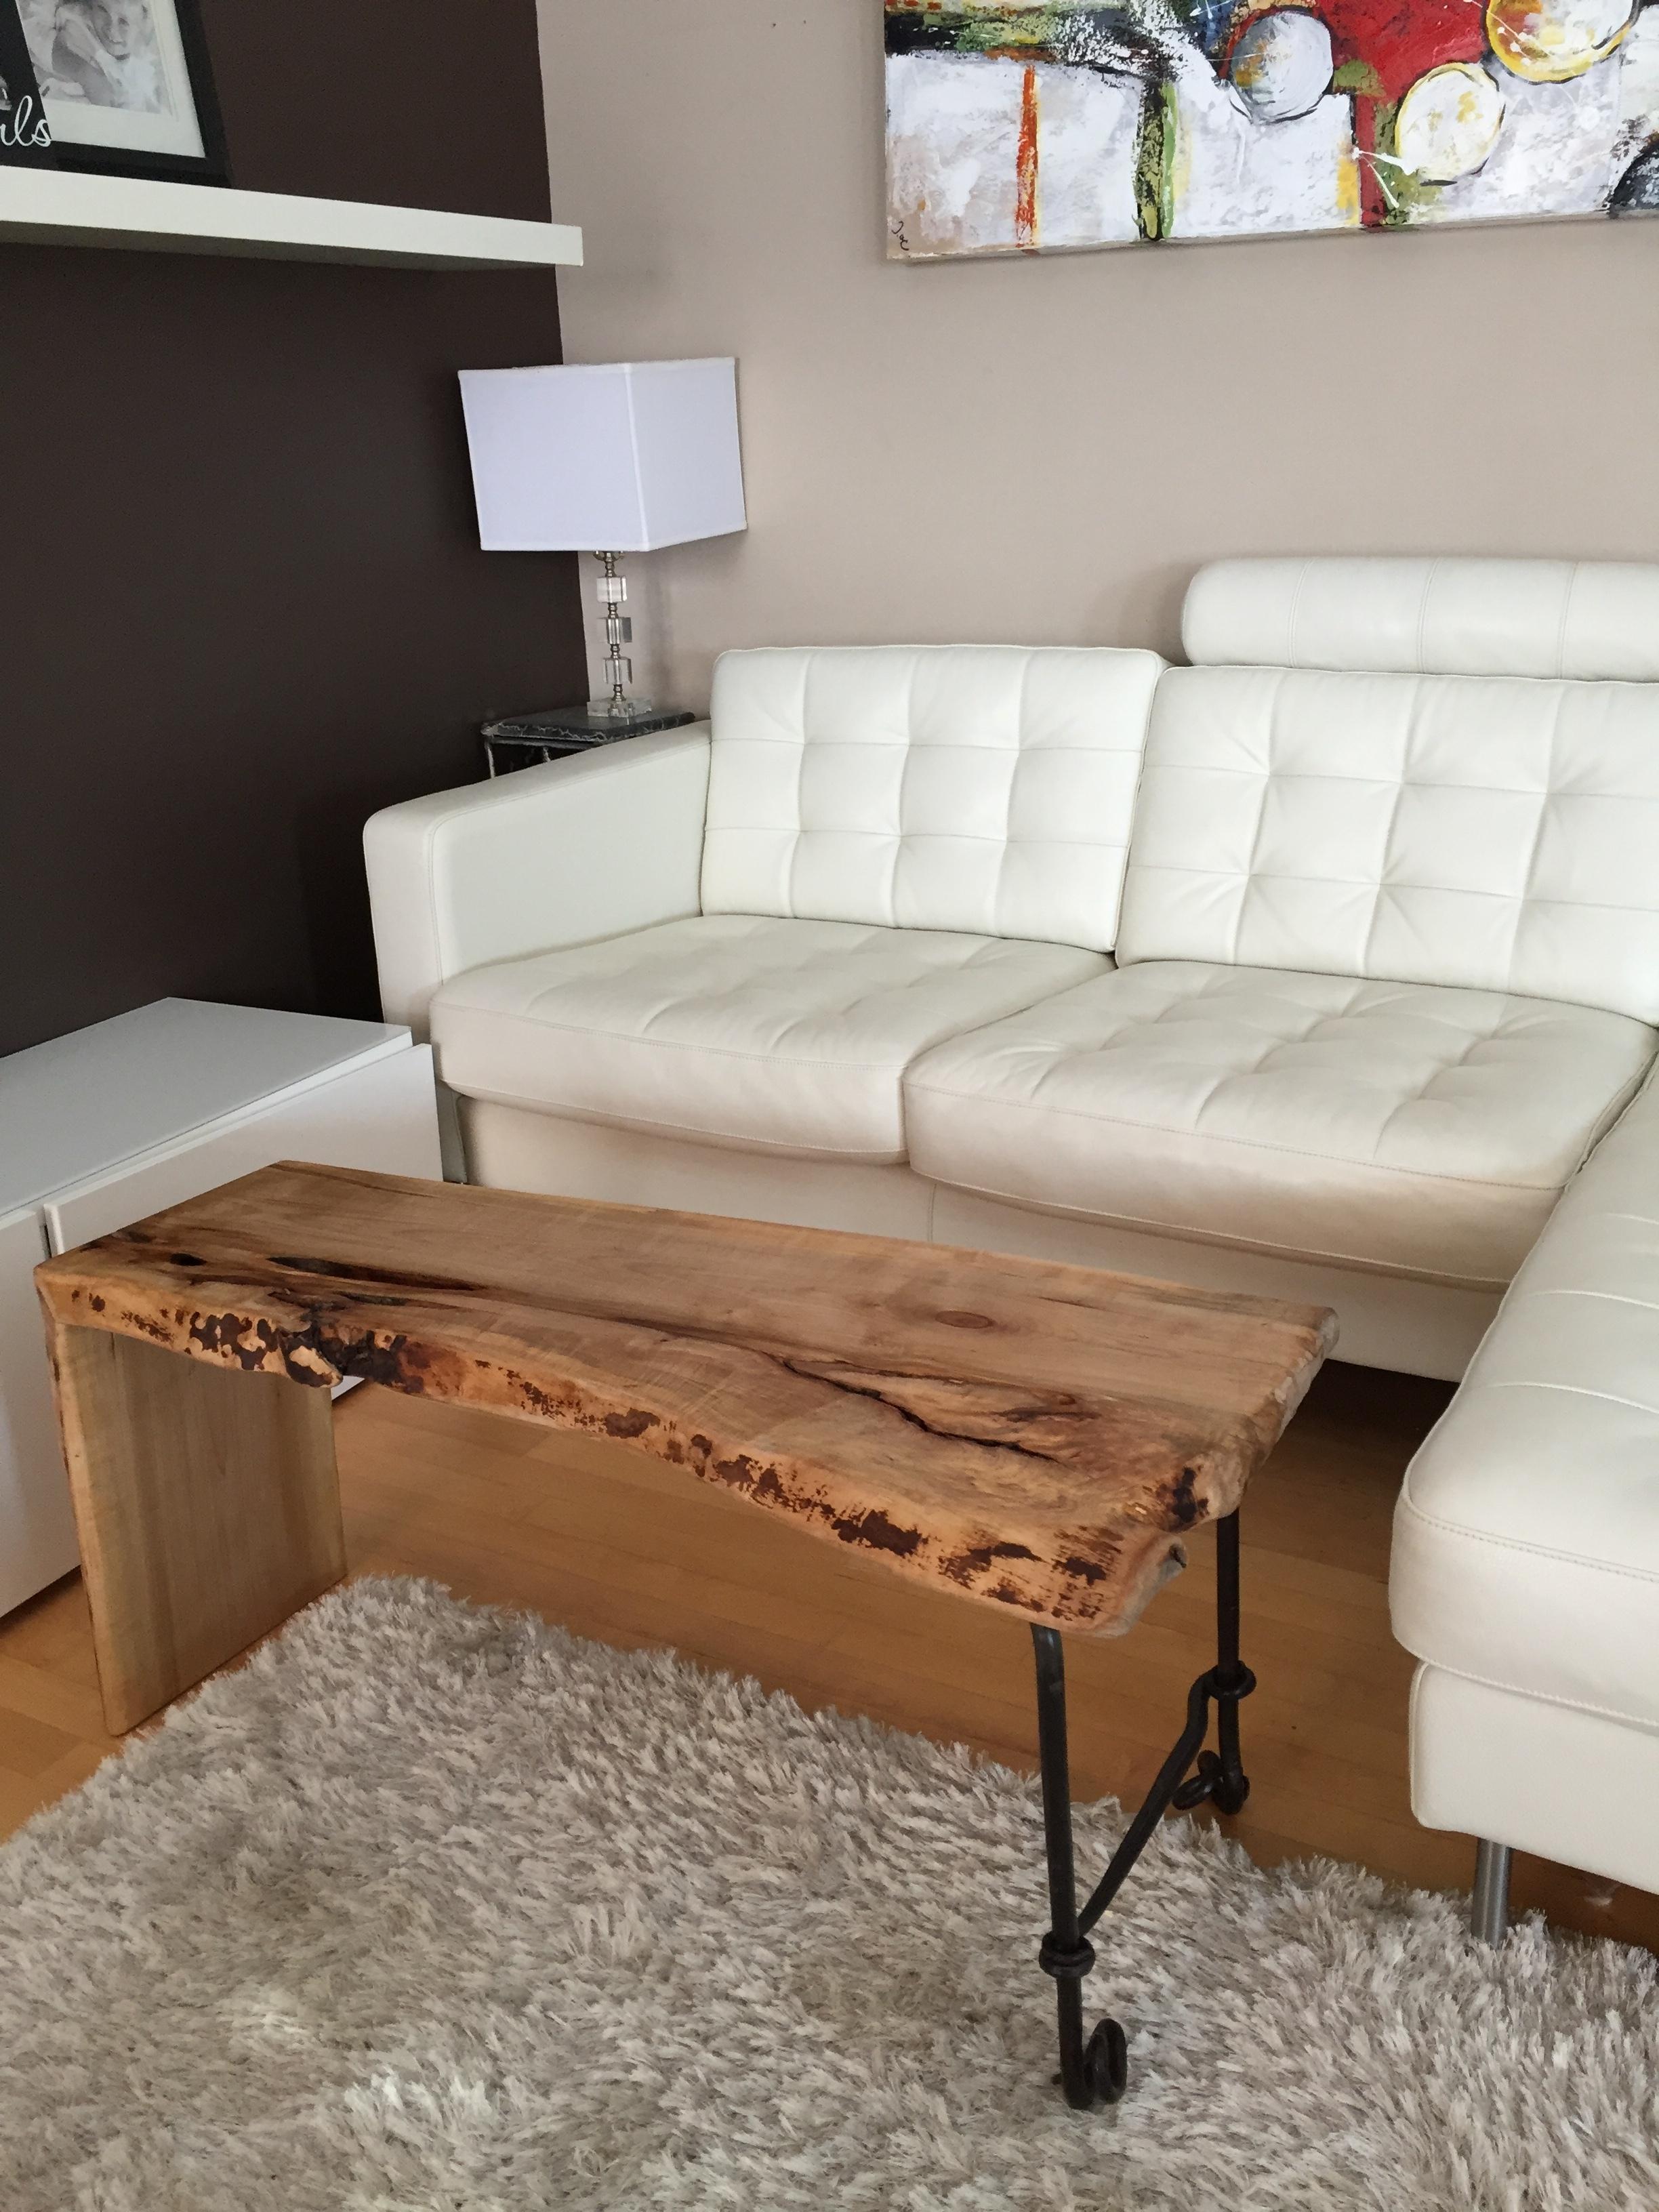 living edge furniture rental. MAPLE - LIVE EDGE BENCH Or COFFEE TABLE Living Edge Furniture Rental